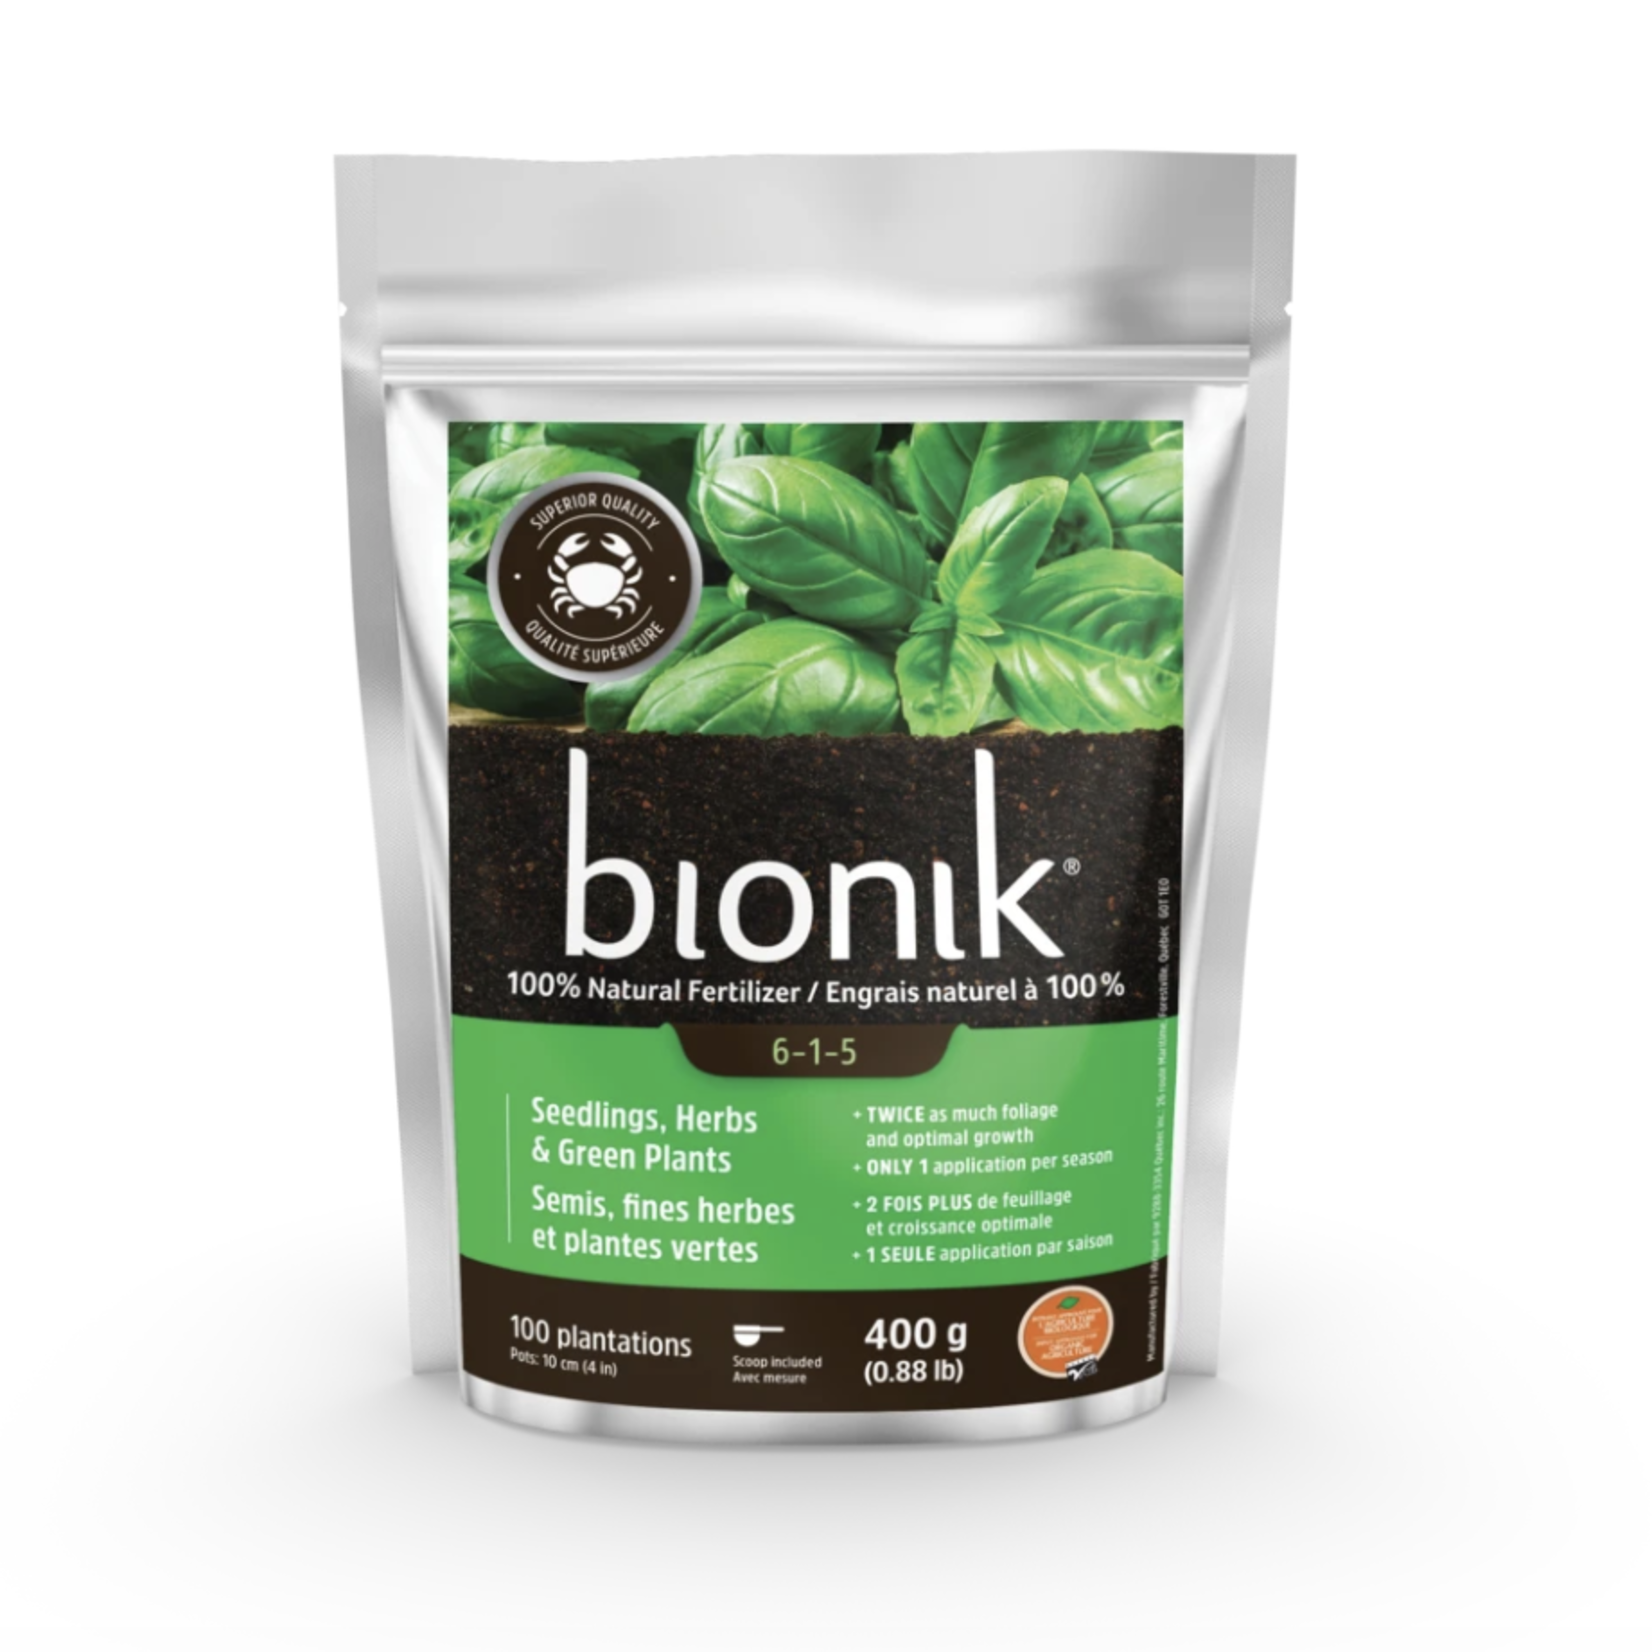 Bionik Semis, fines herbes et plantes vertes 85 g